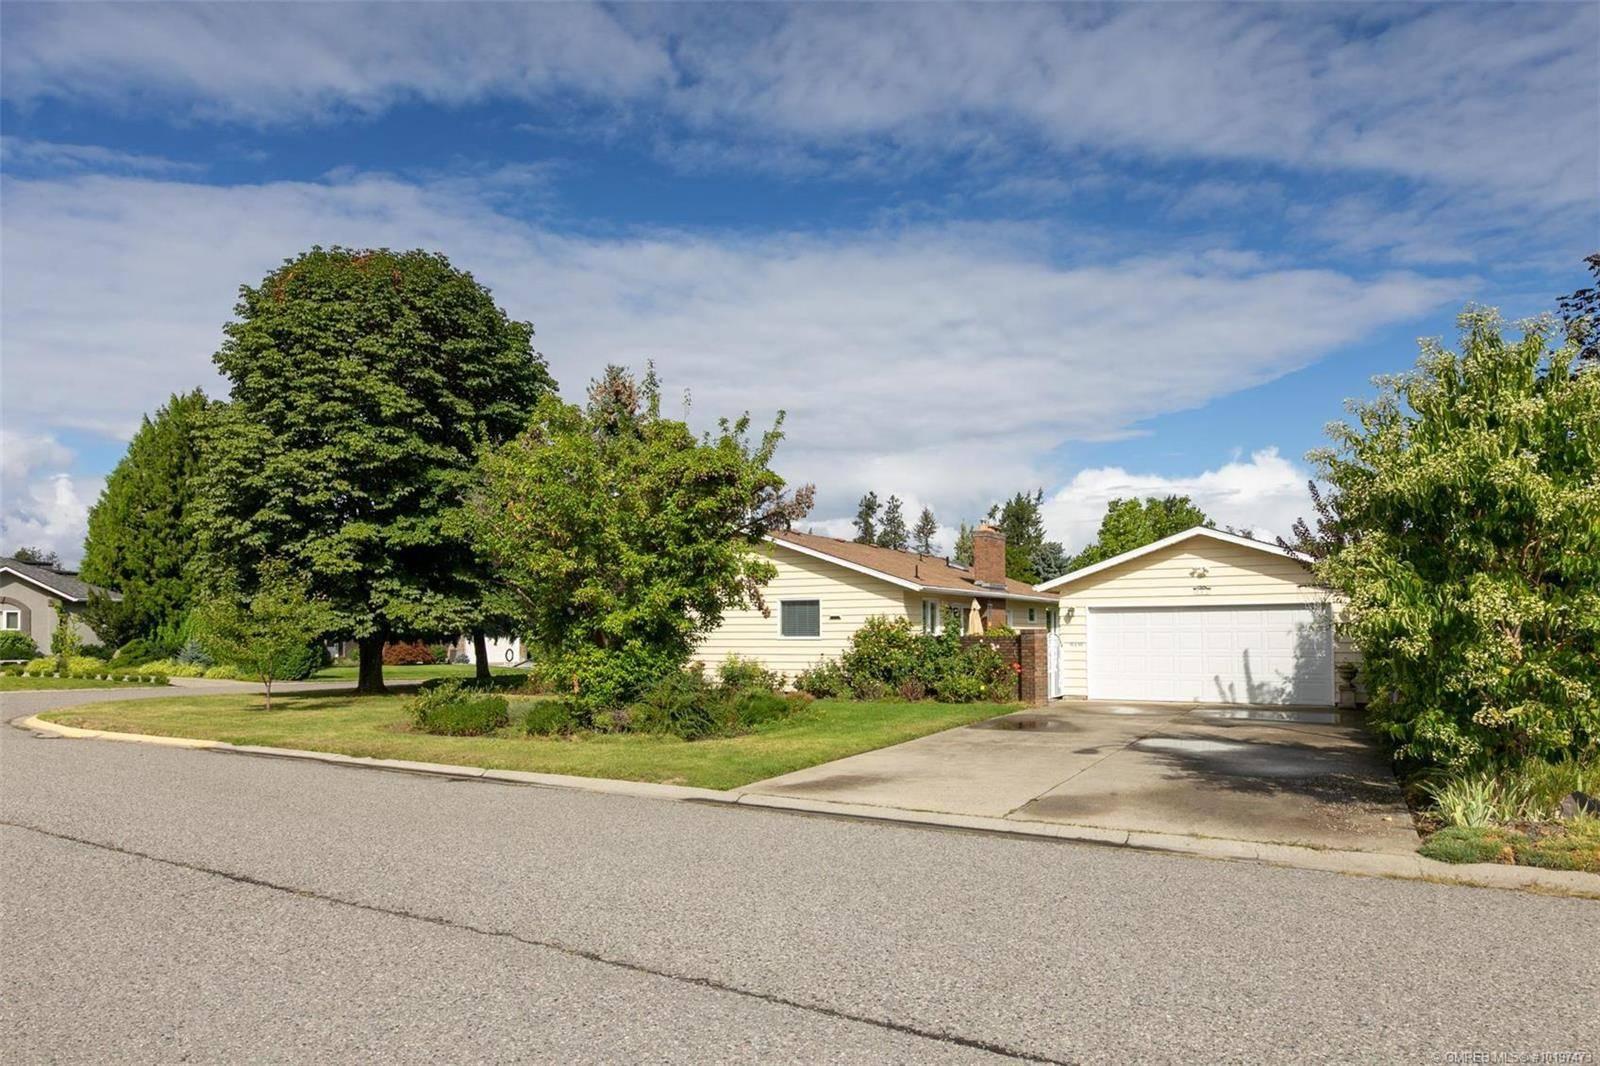 House for sale at 661 Greene Rd Kelowna British Columbia - MLS: 10197473